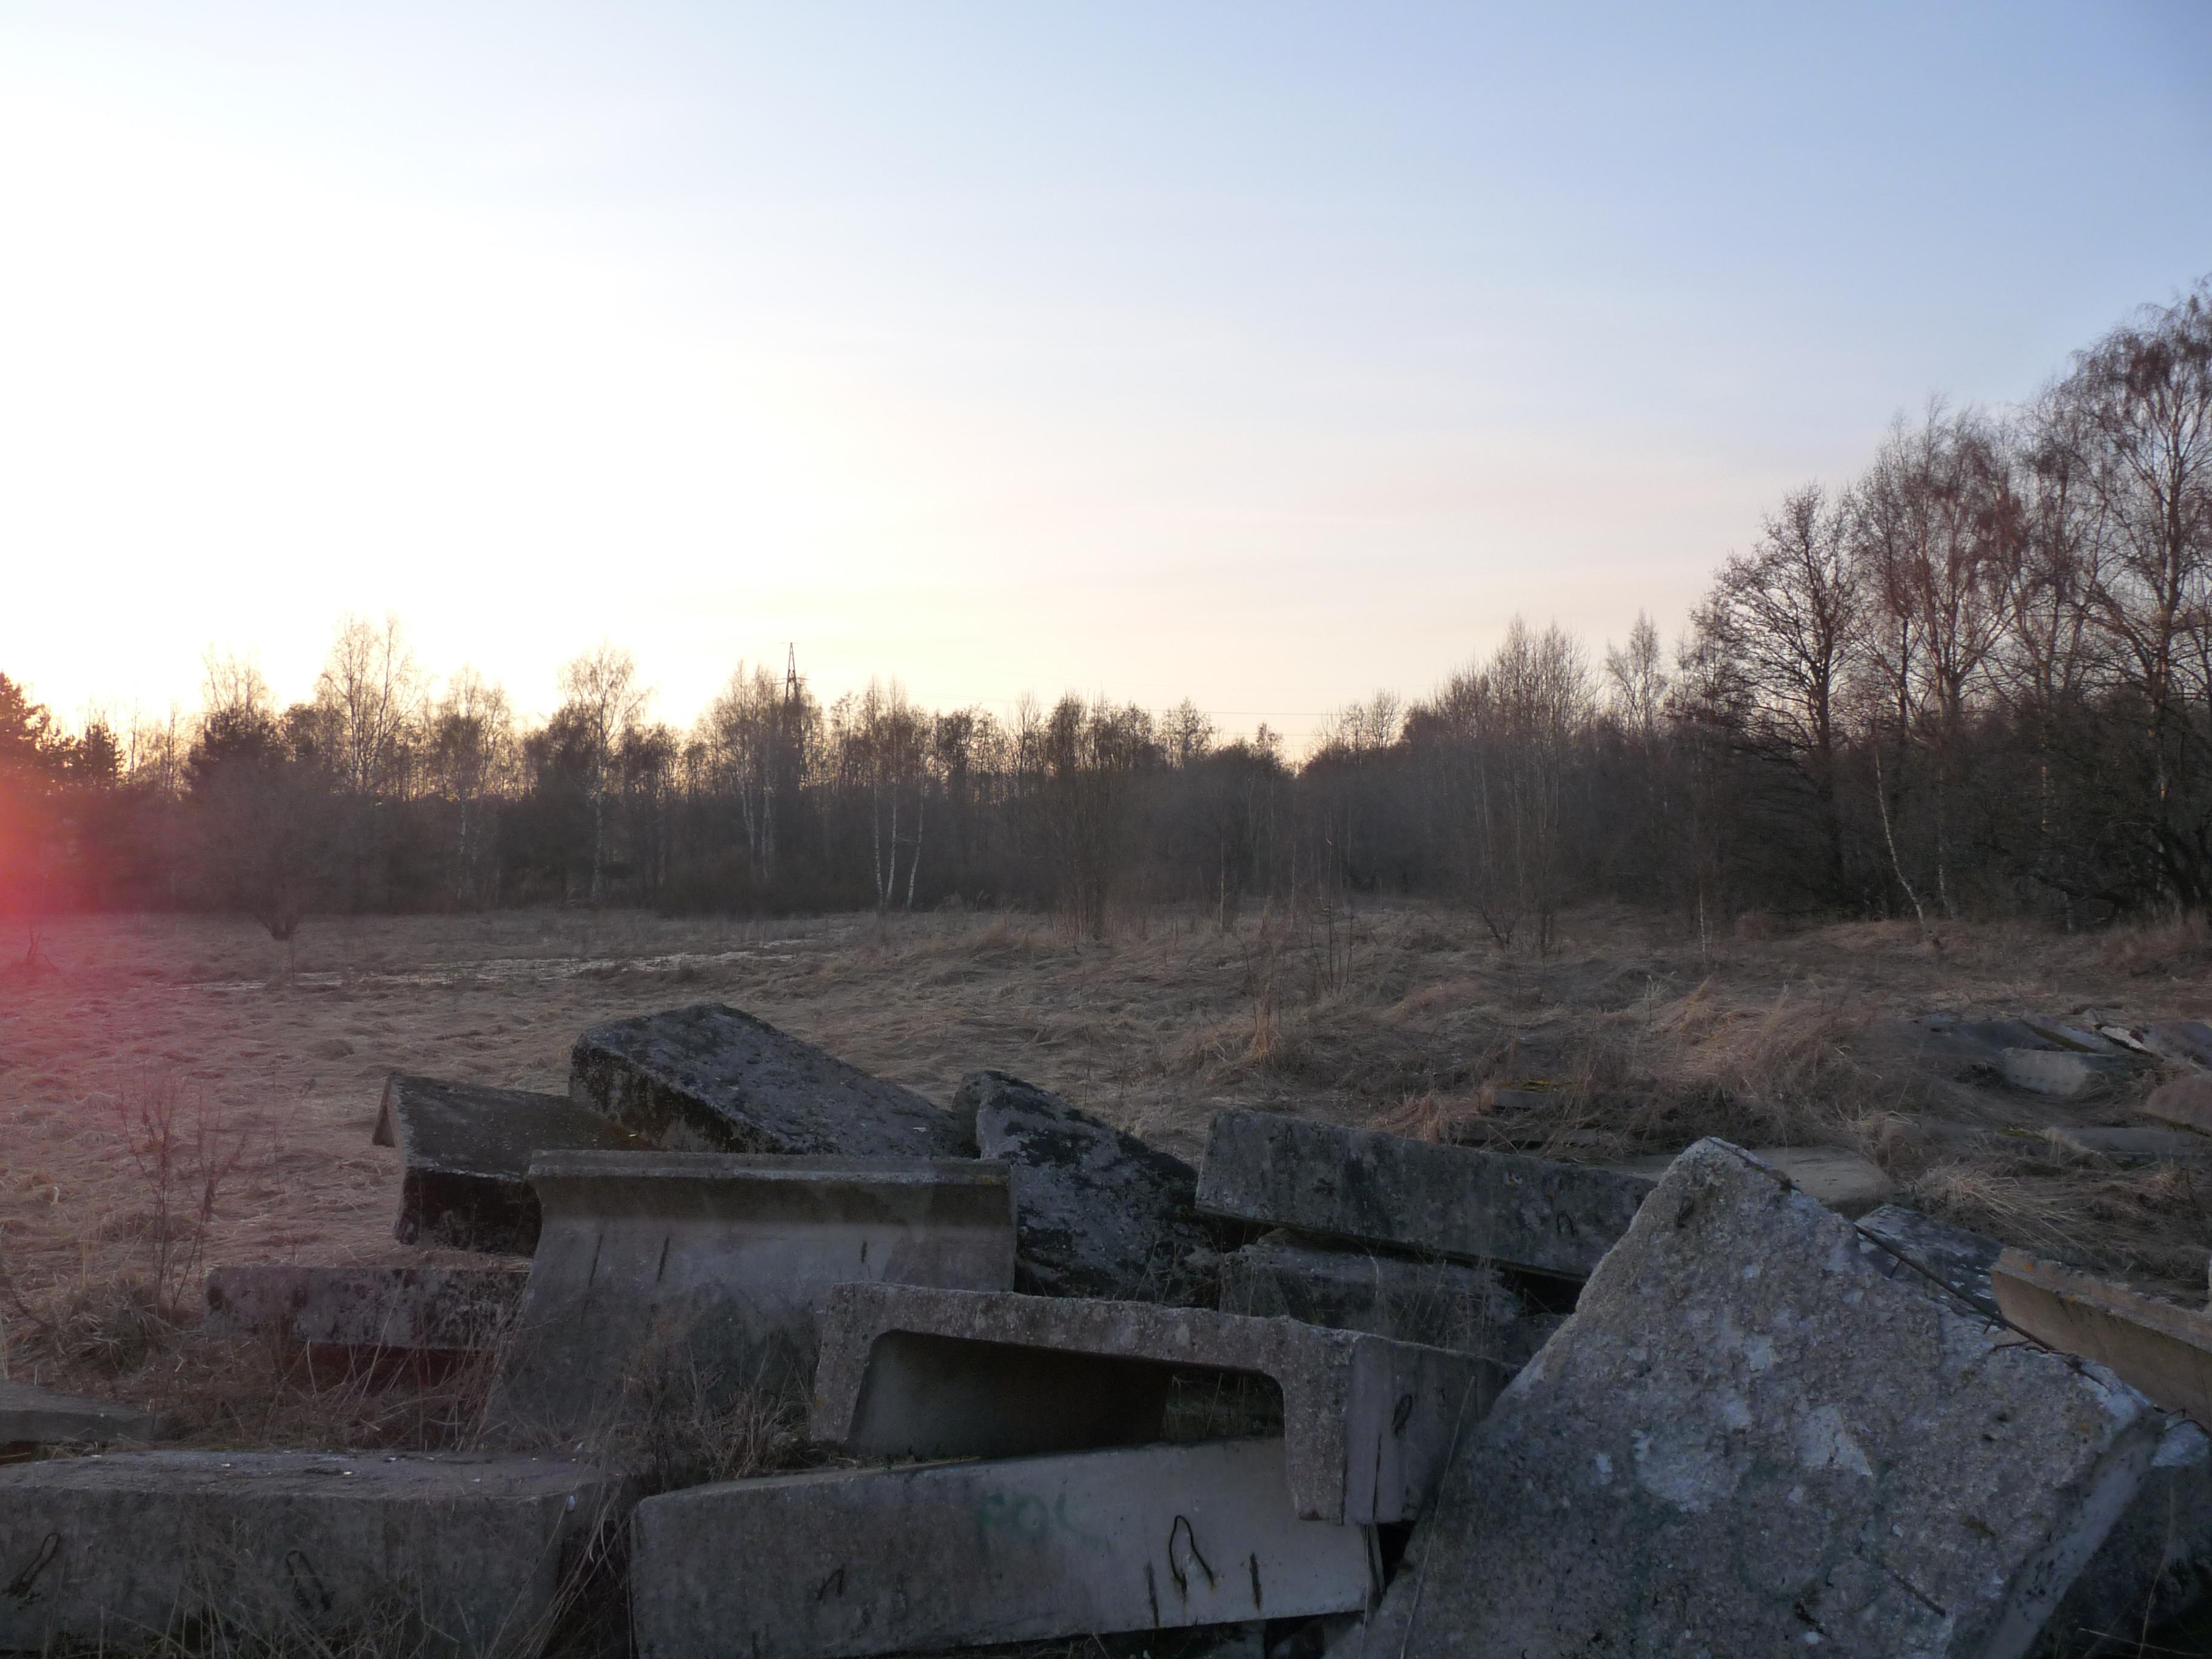 EU-EE-Tallinn-PT-Merimets-Concrete panels.JPG